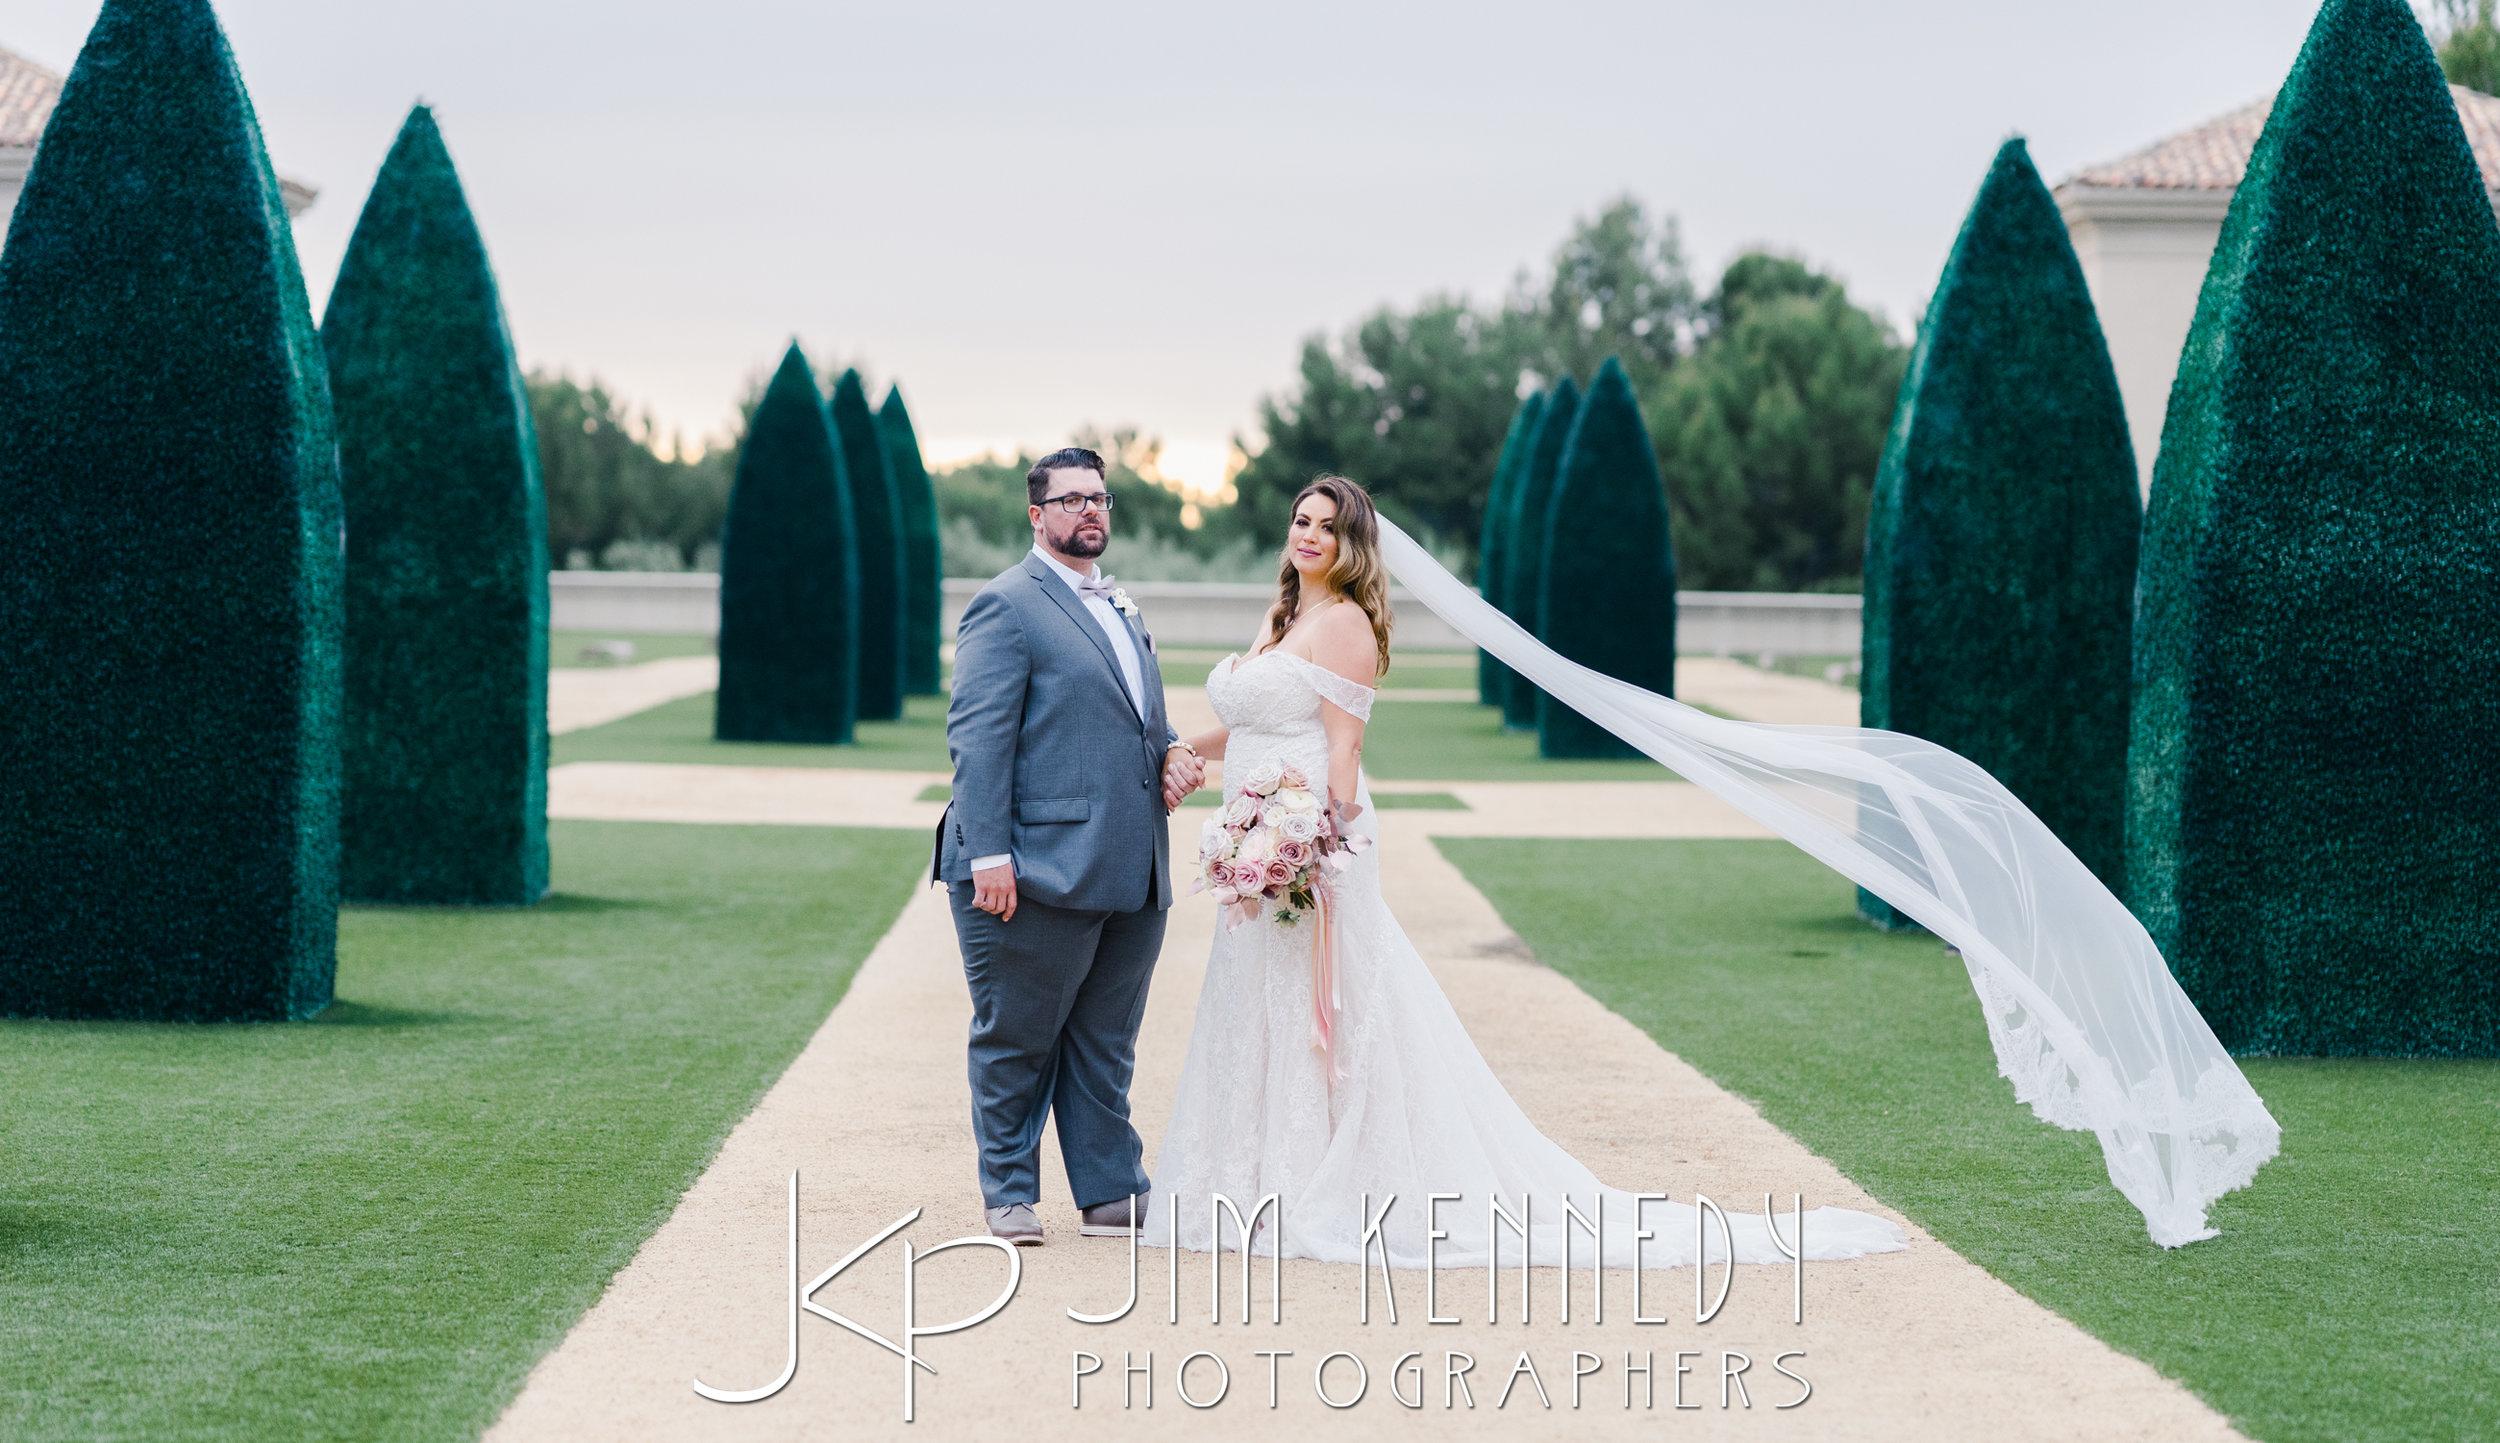 pelican-hill-wedding-jim-kenedy-photographers_0171.JPG